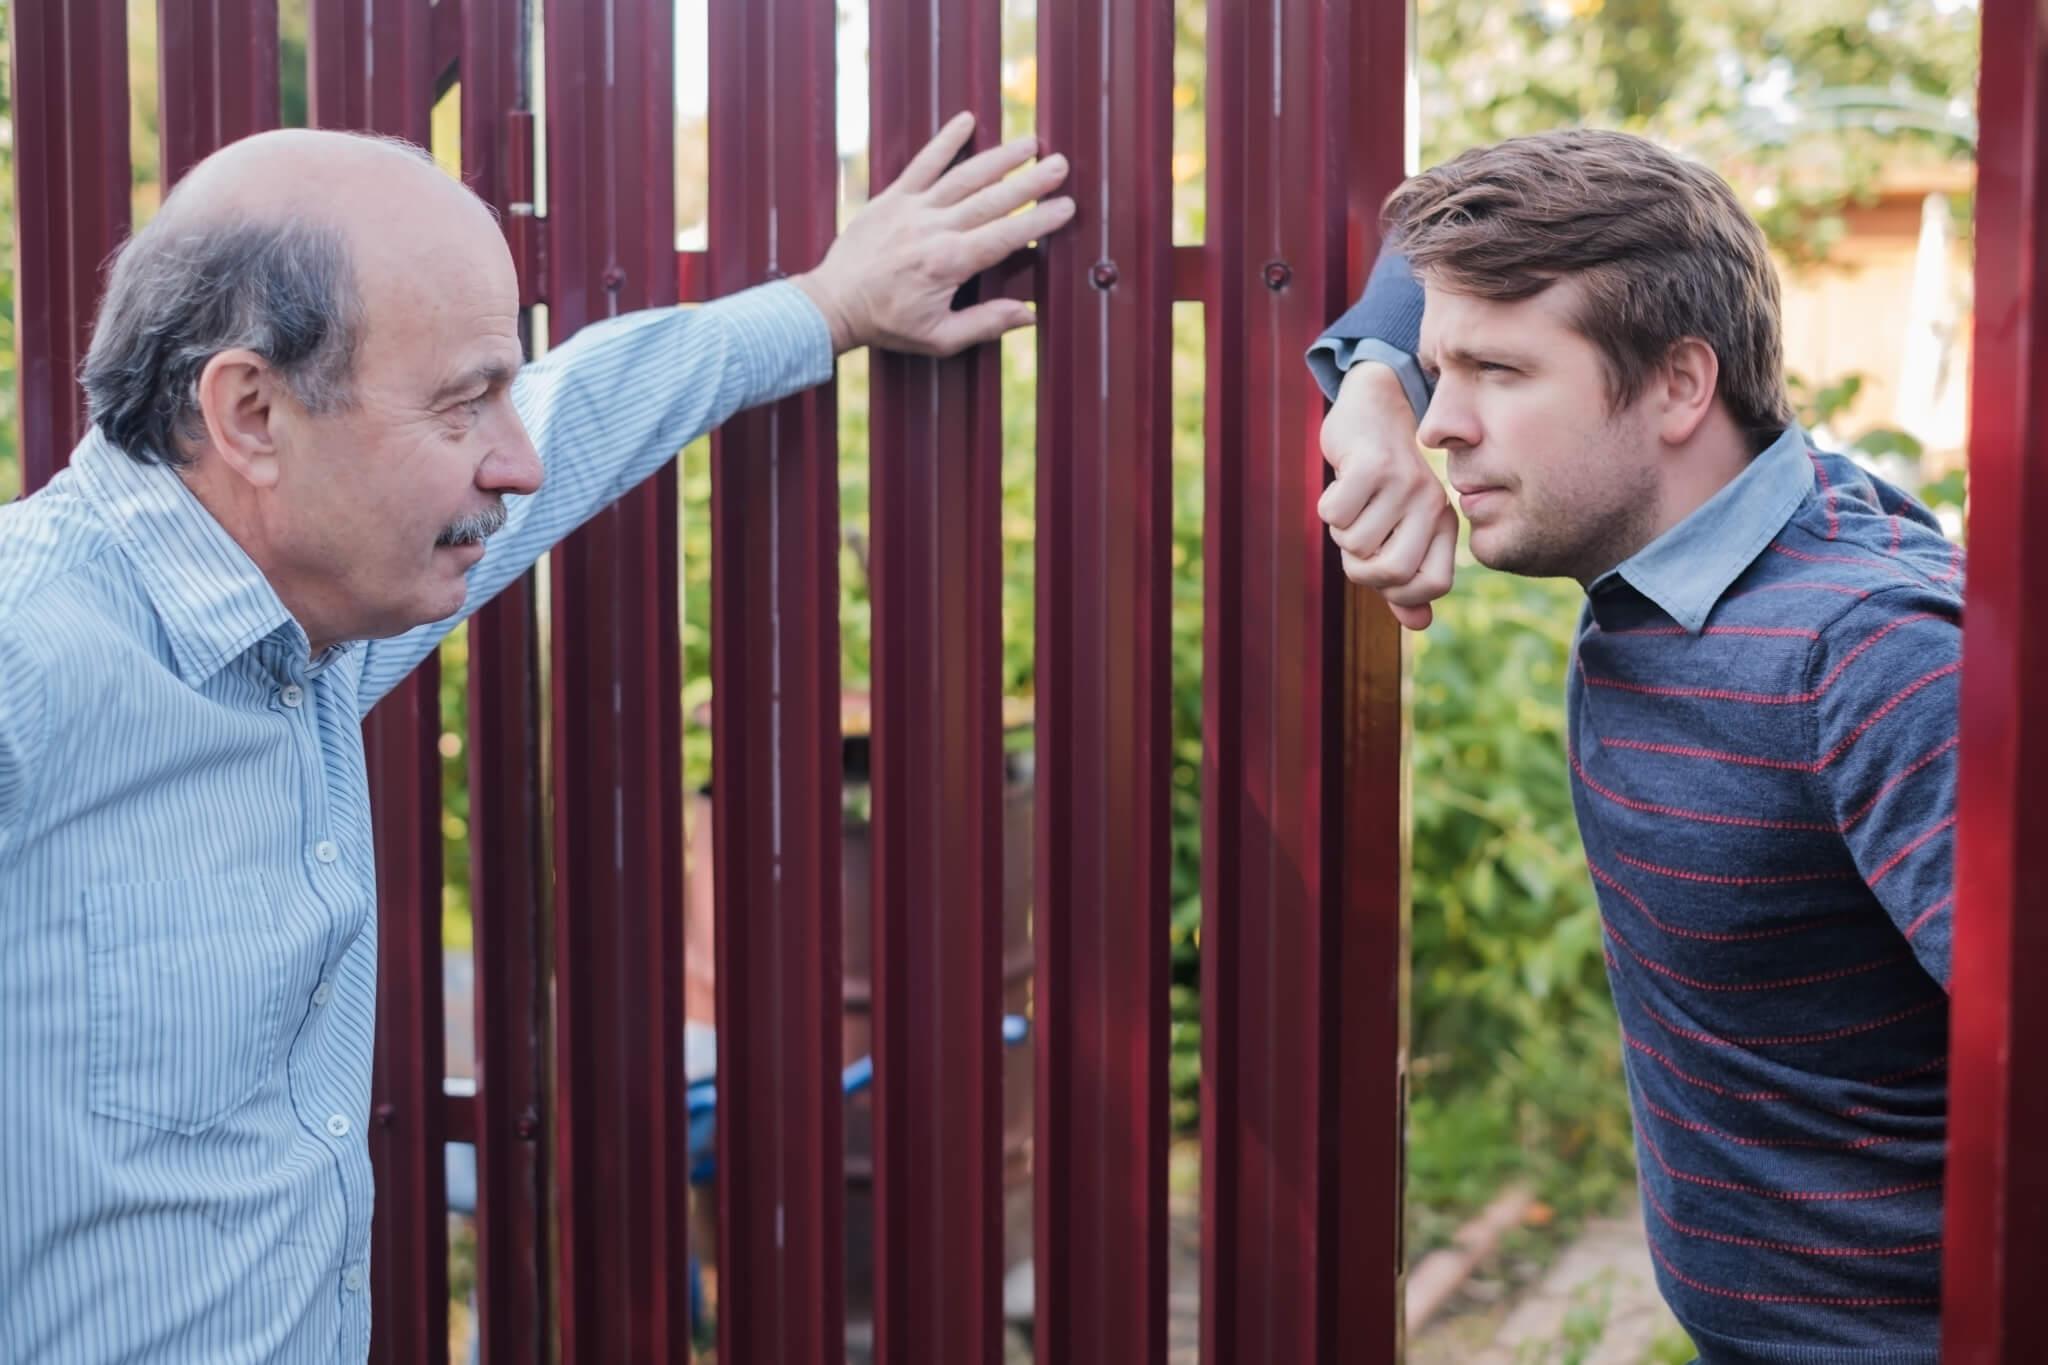 two neighbors talking through fence gate